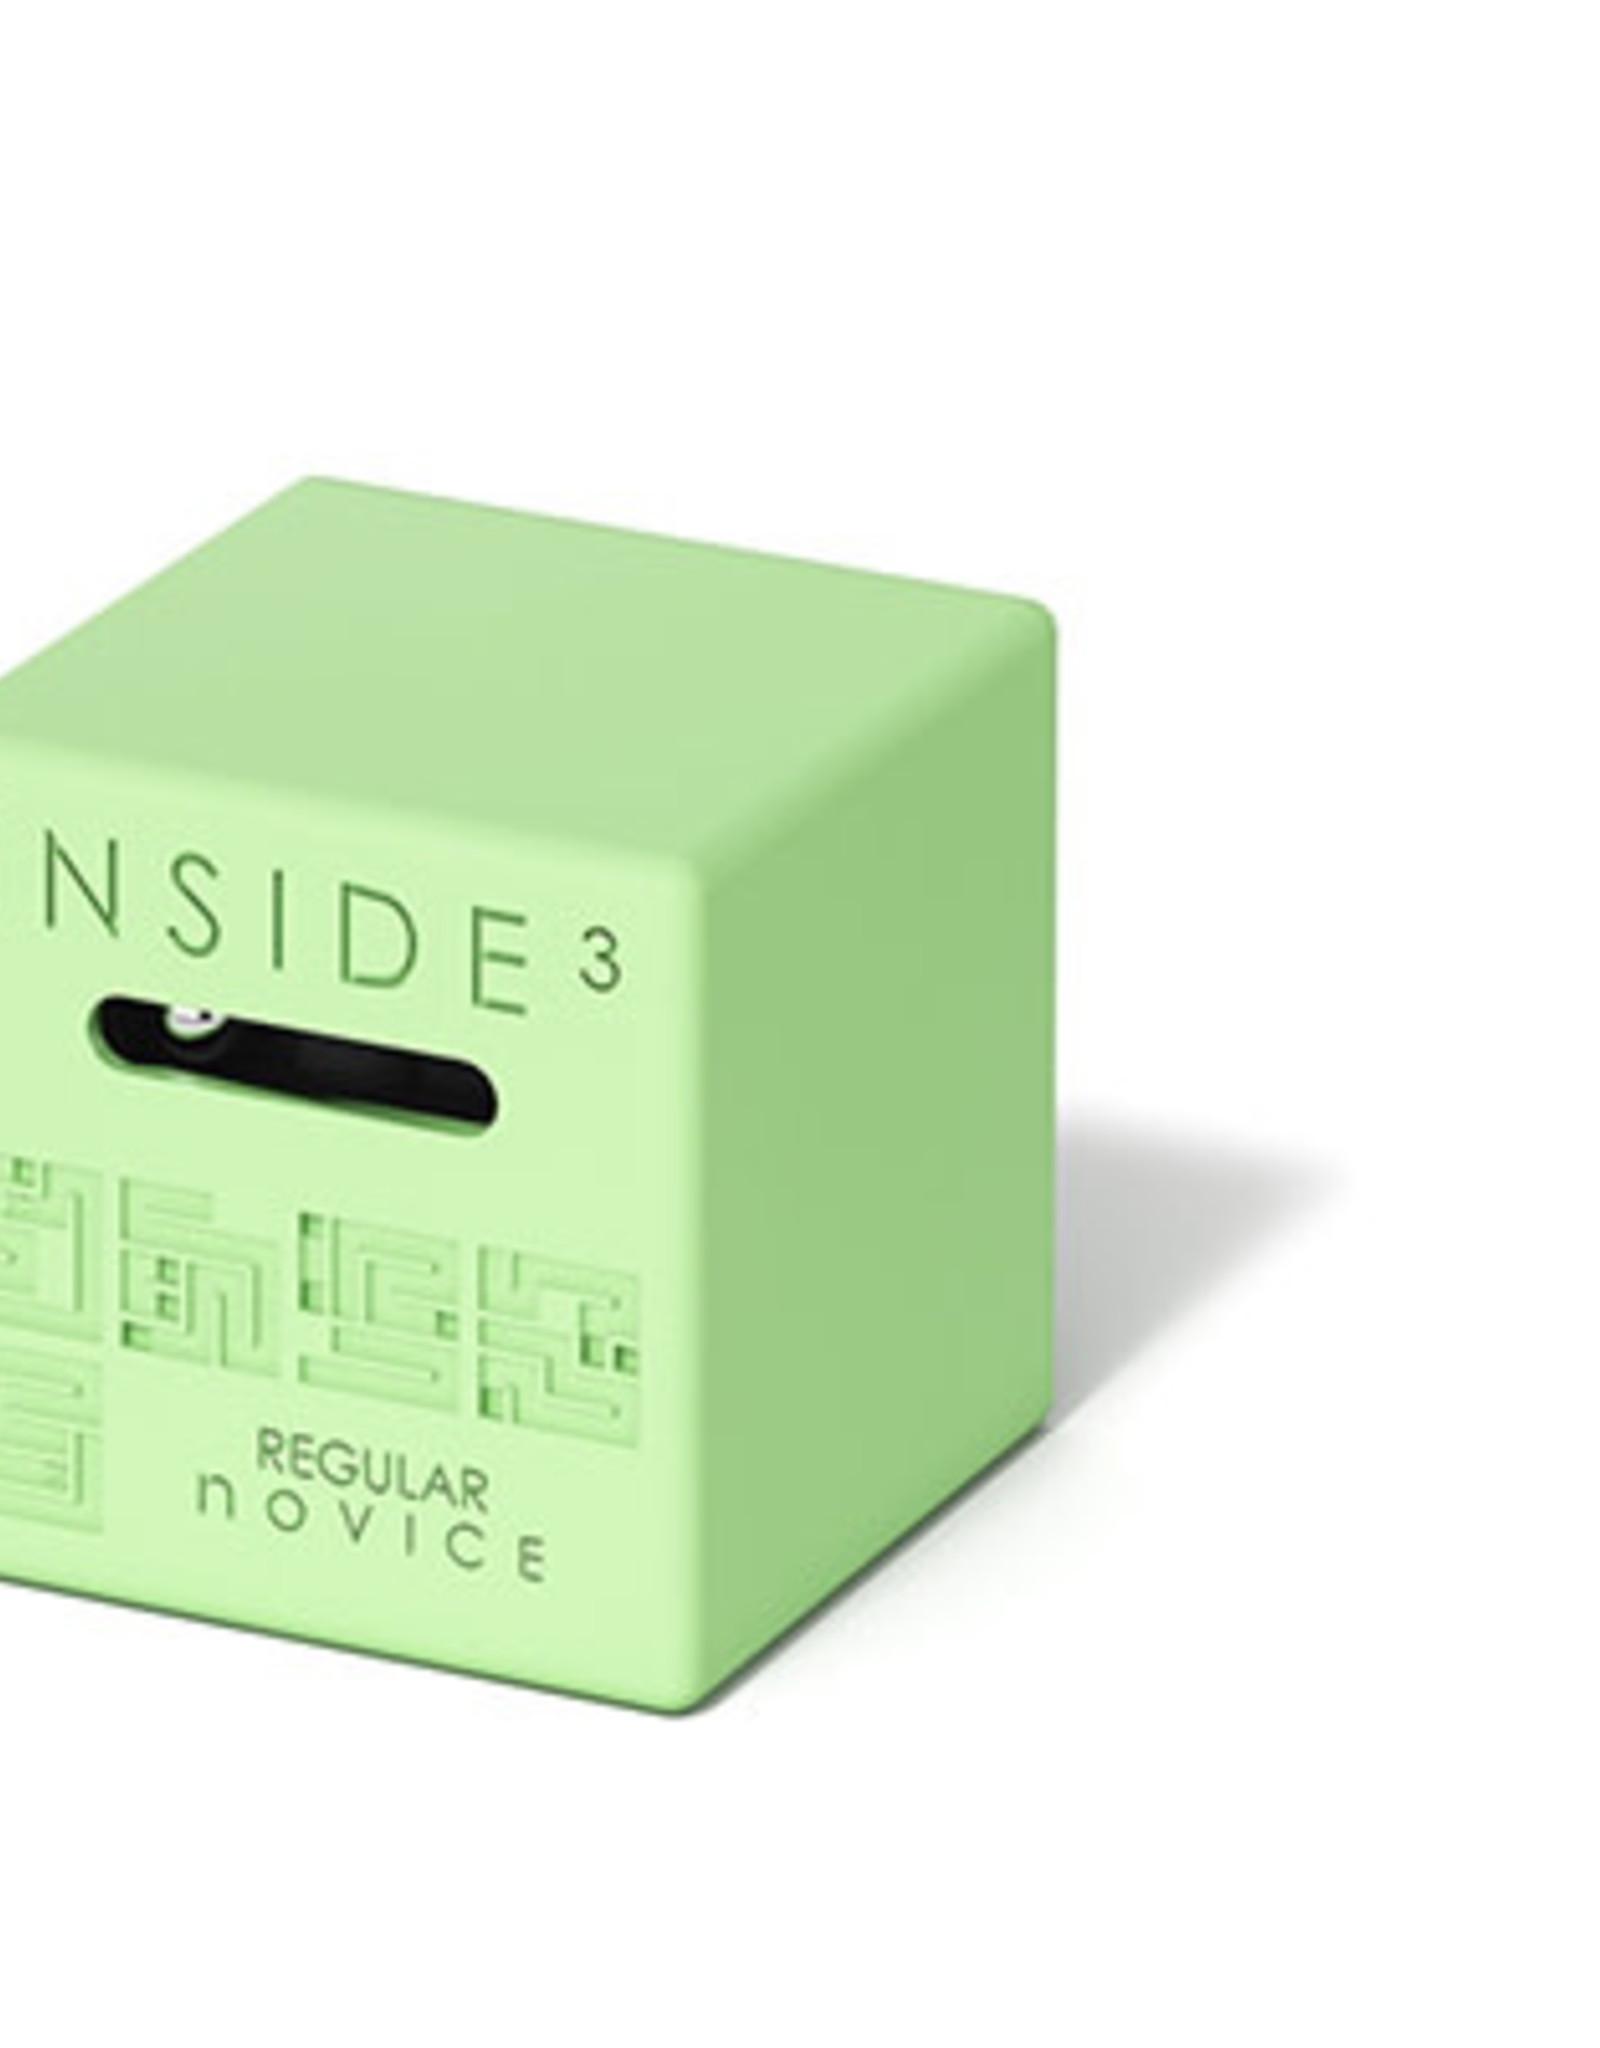 Inside 3, NoVice Series Assortment